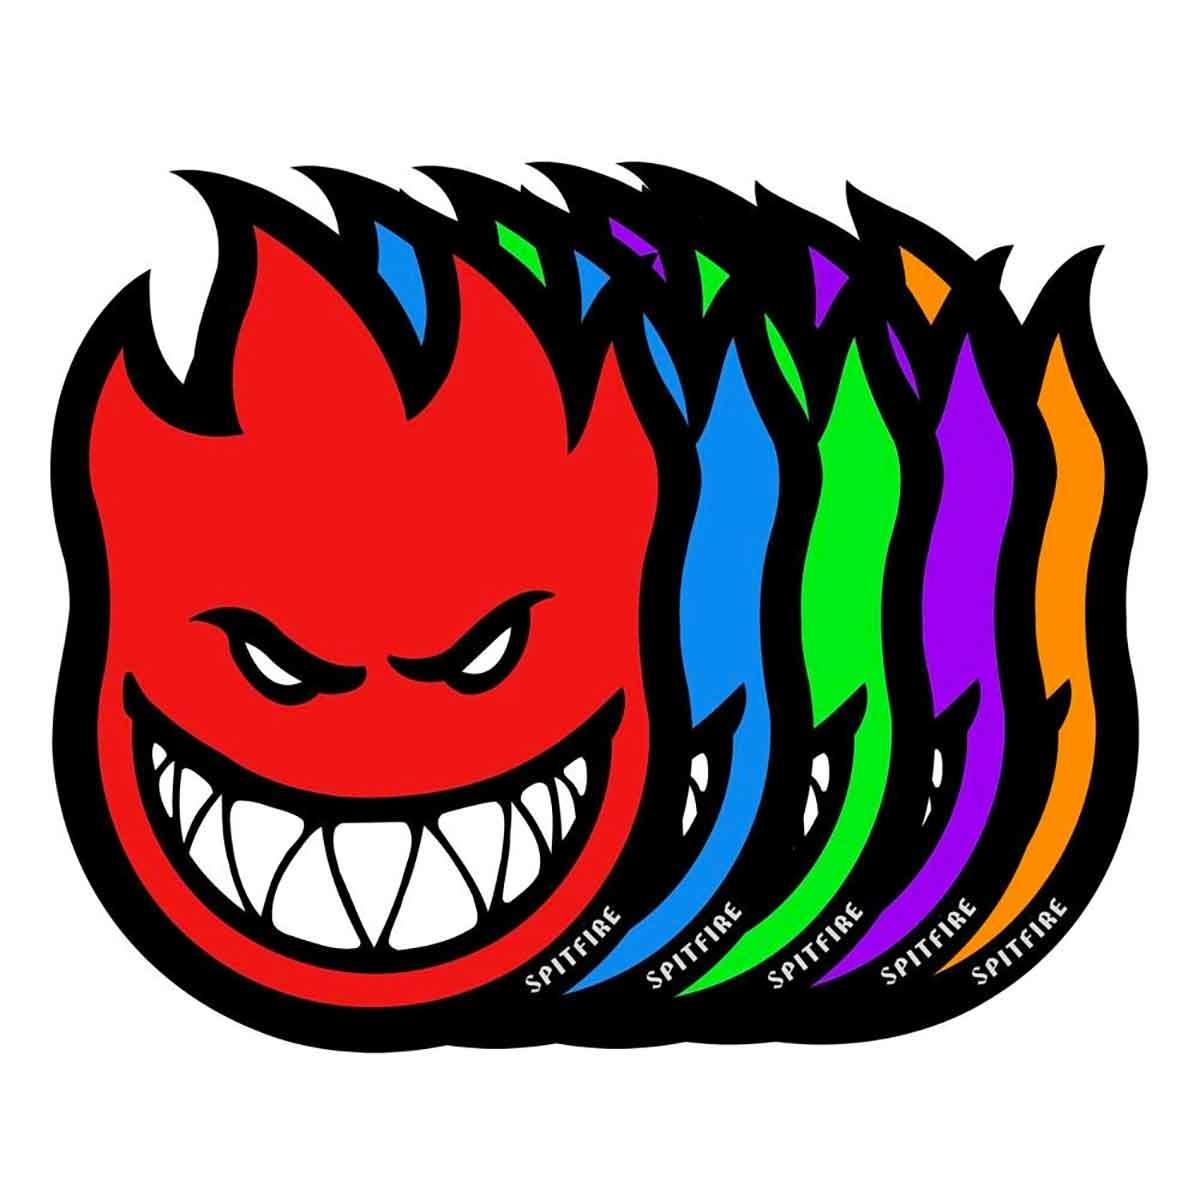 spitfire sf fireball 25in sticker